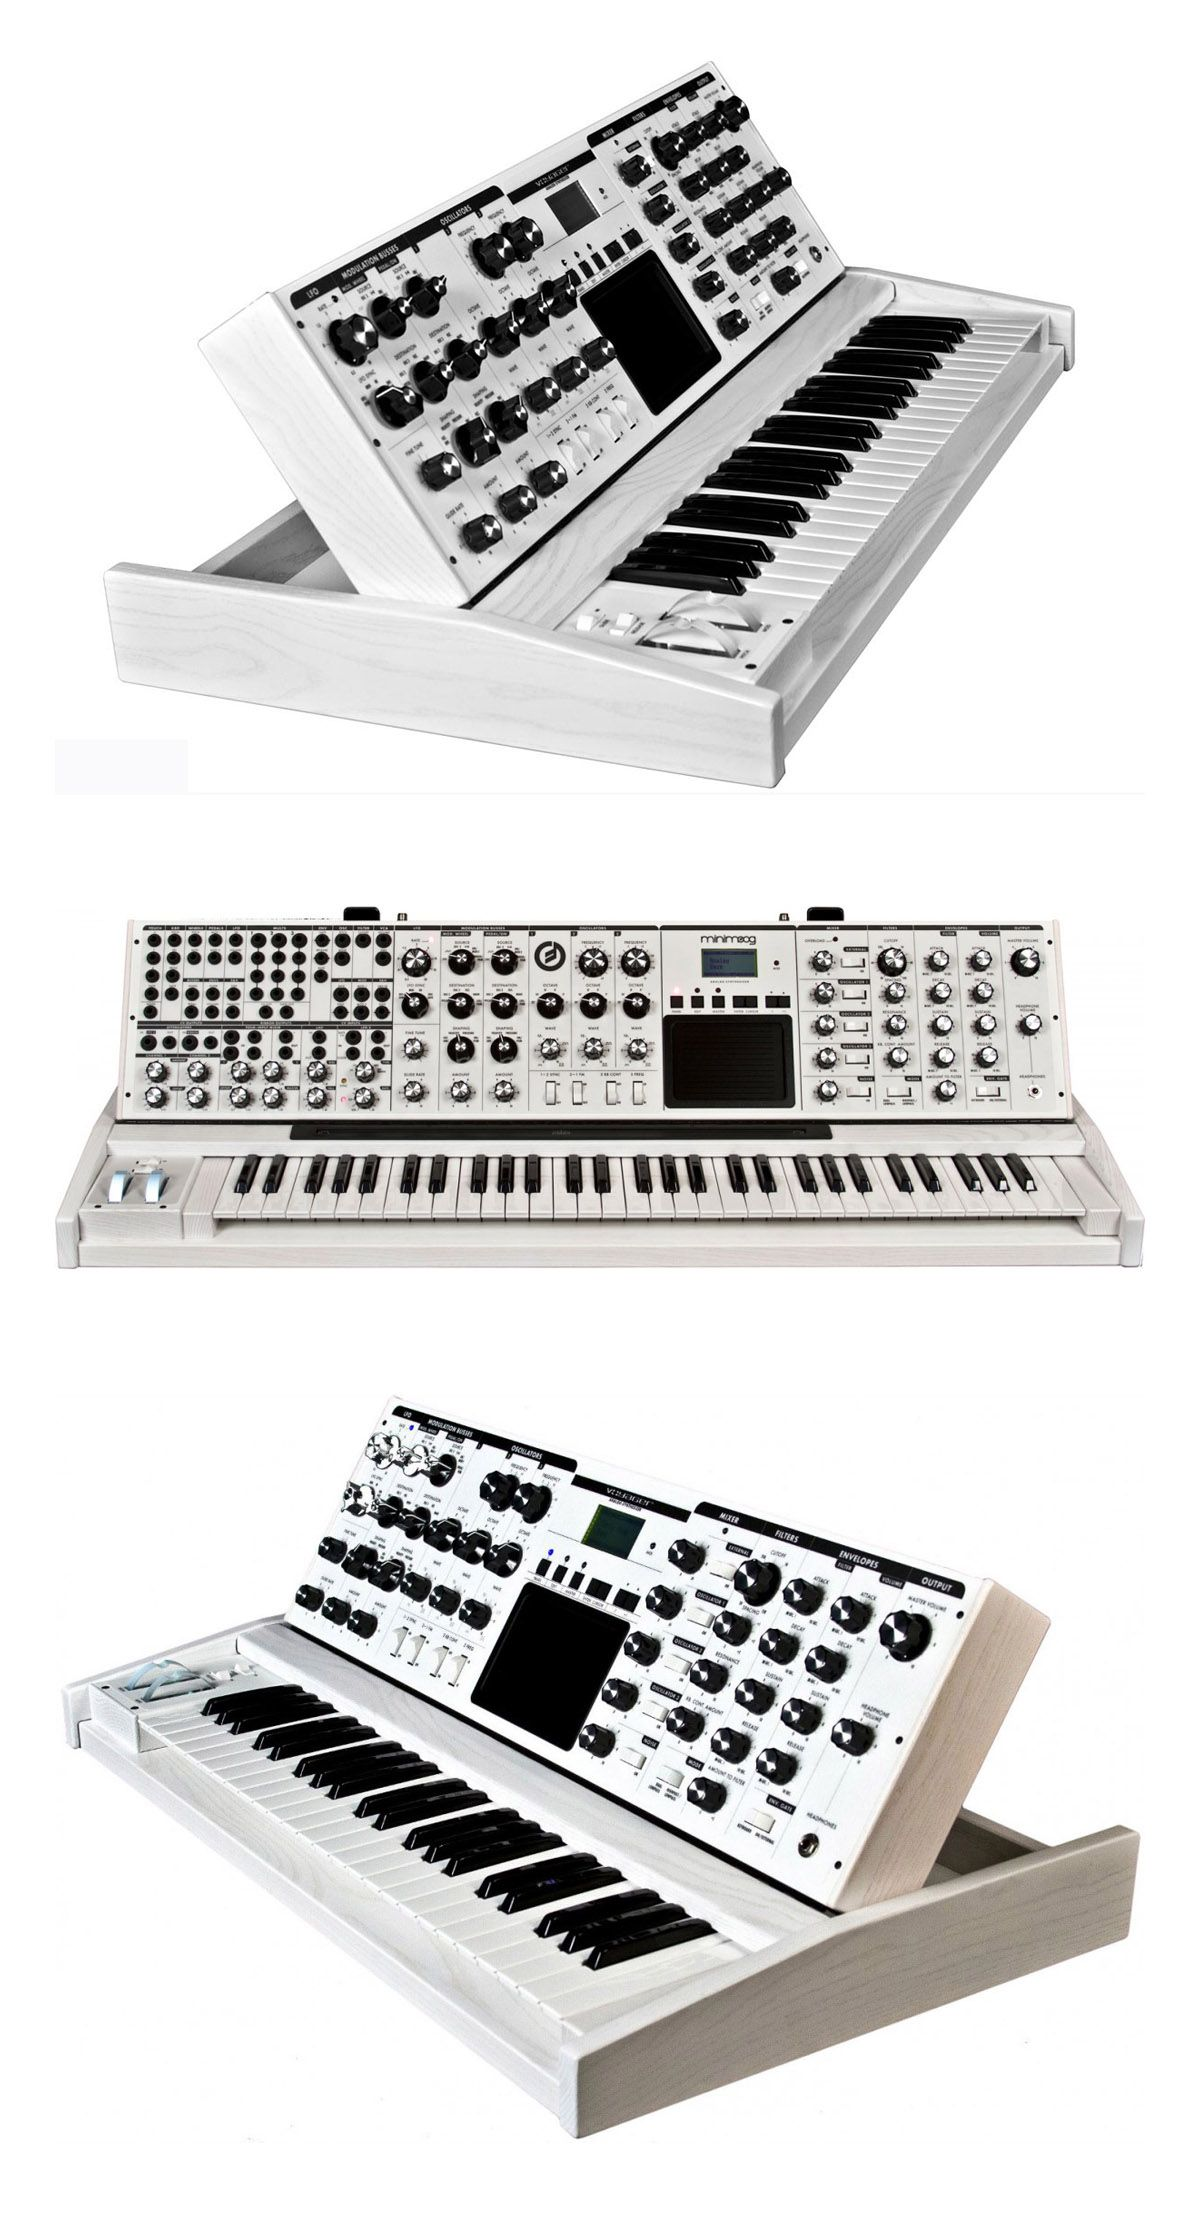 Moog MiniMoog Voyager XL - Analog Keyboard The Moog MiniMoog